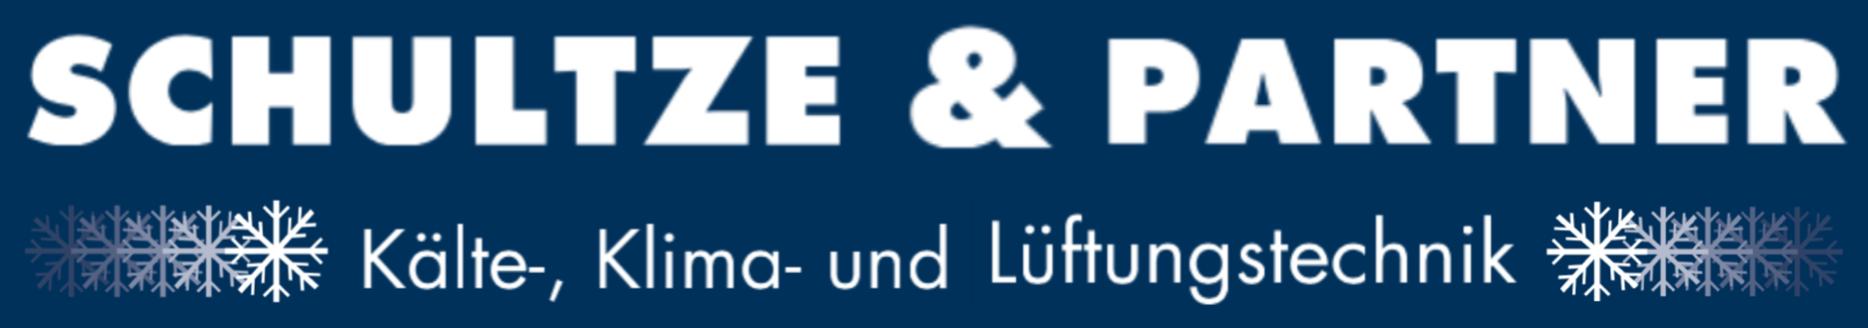 Schultze & Partner